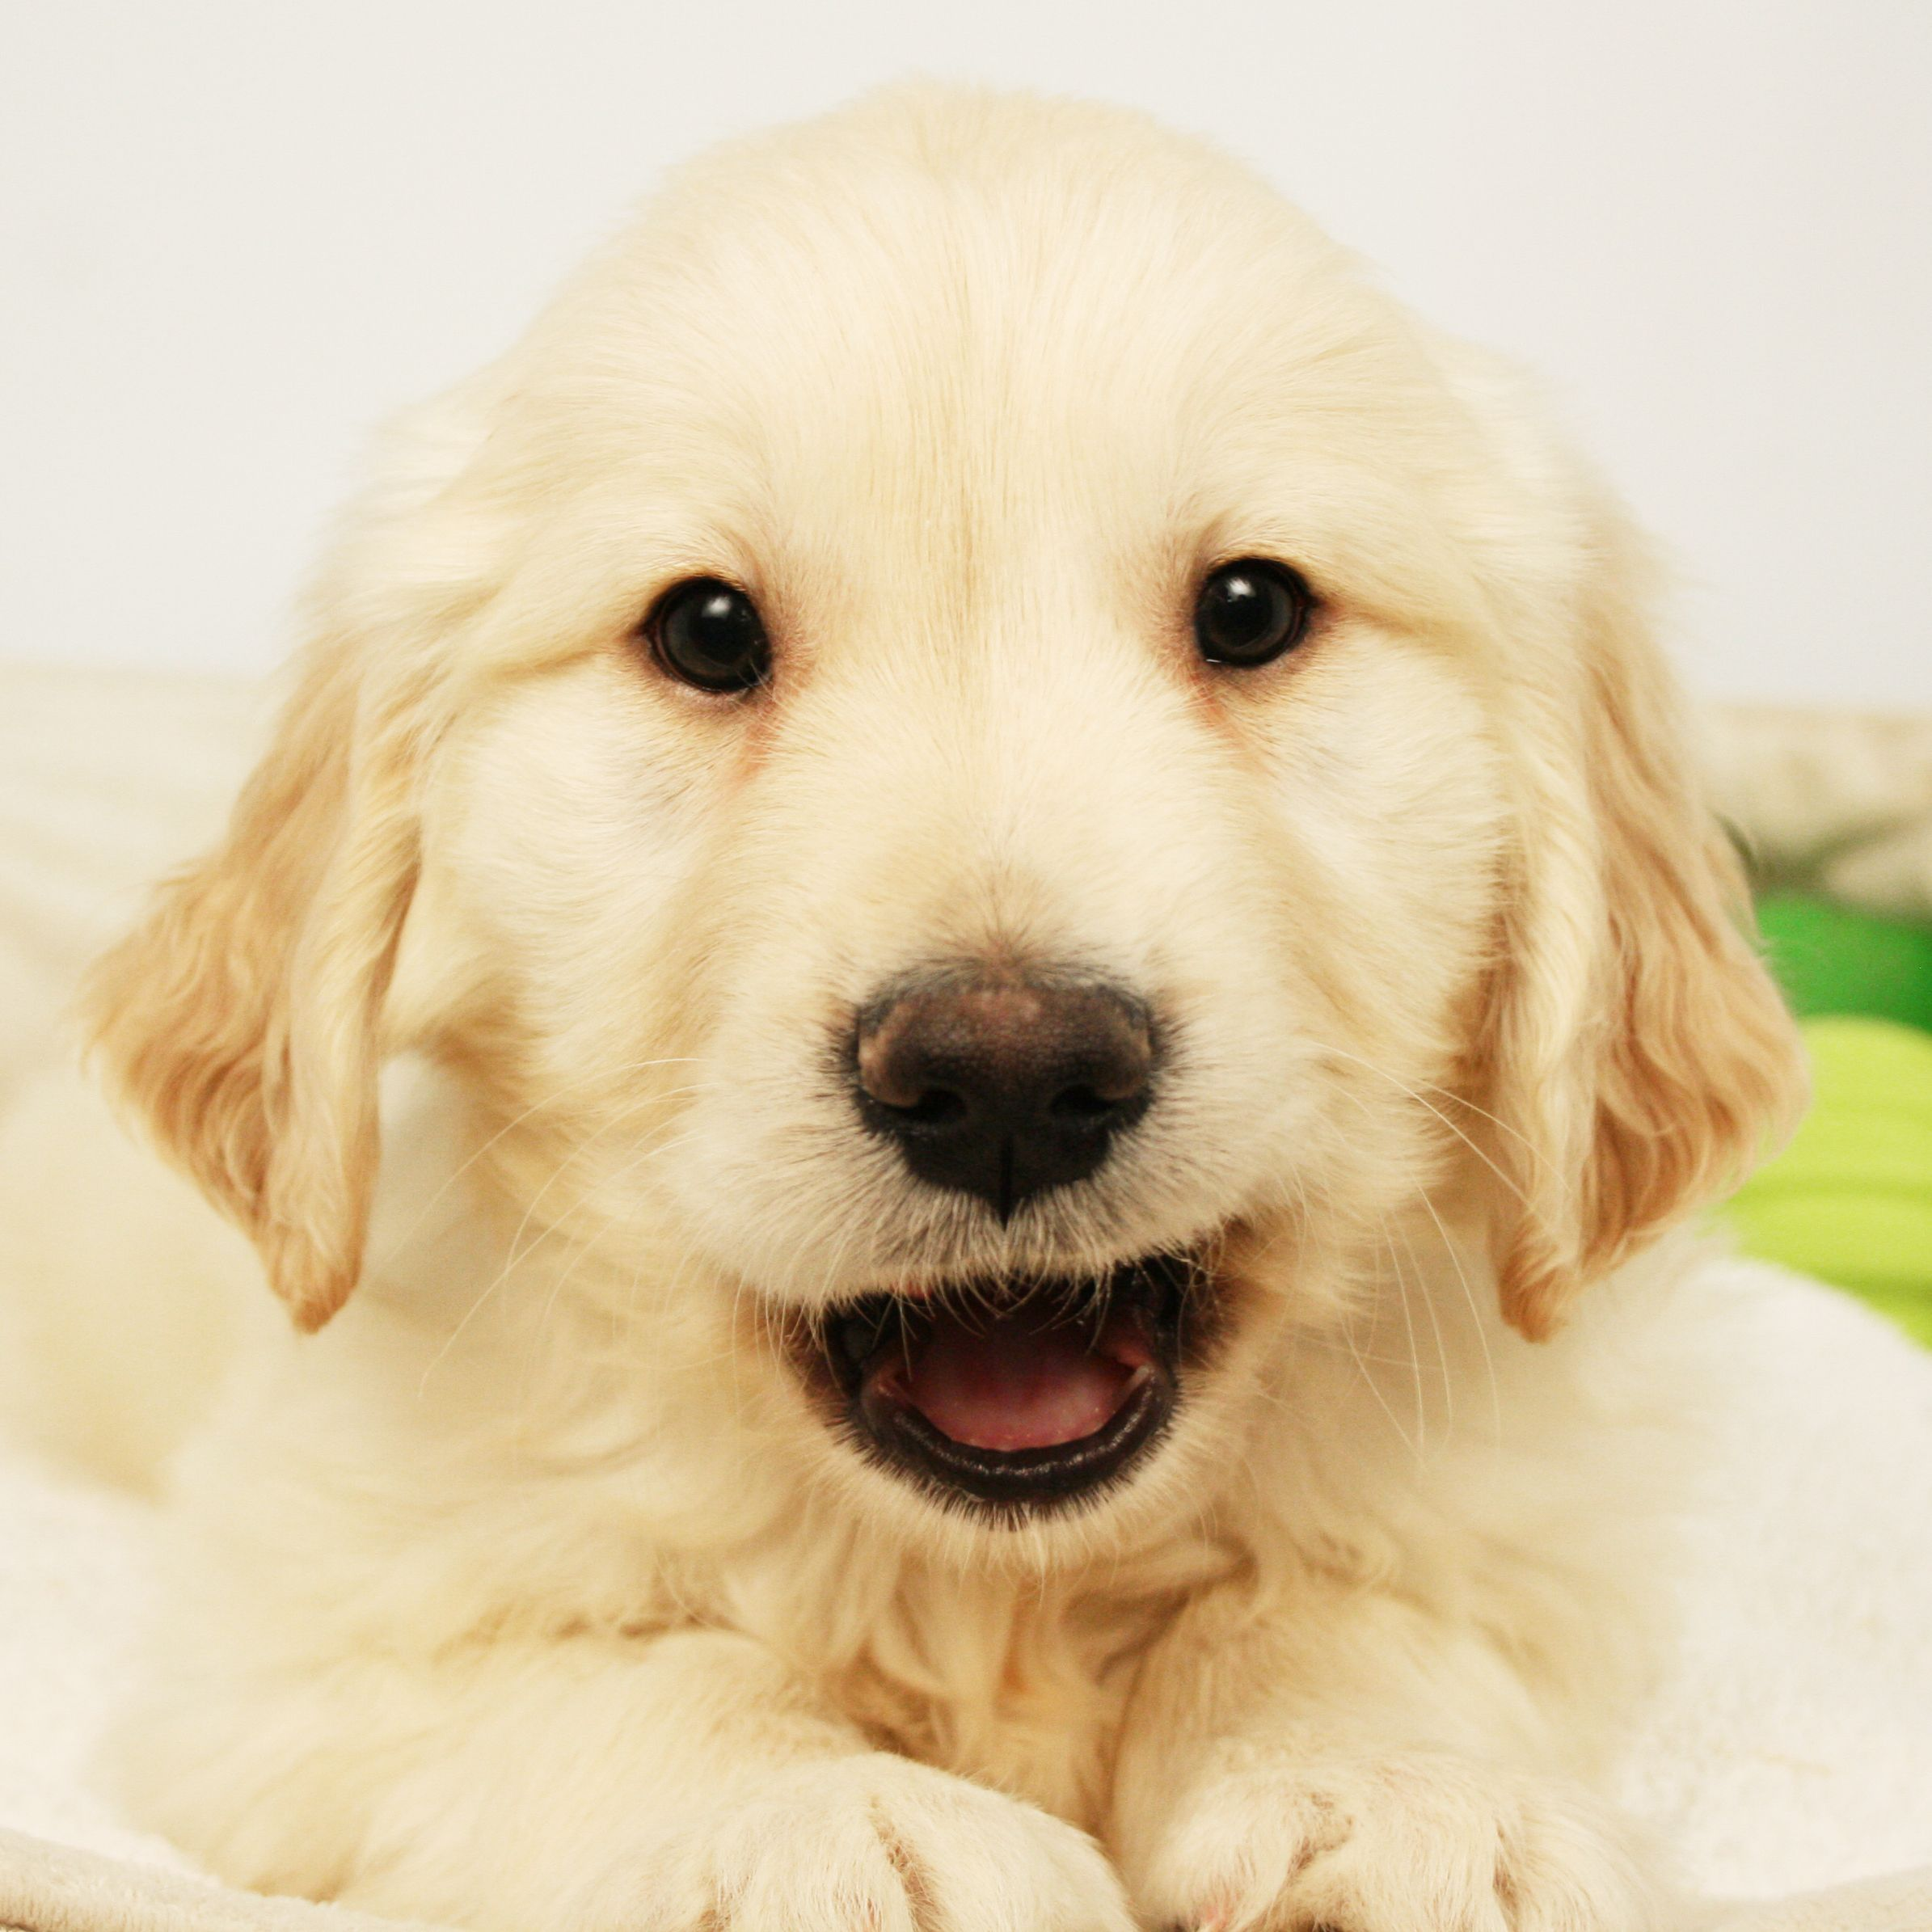 Put Me In Coach Cute Baby Animals Retriever Puppy Cute Puppies